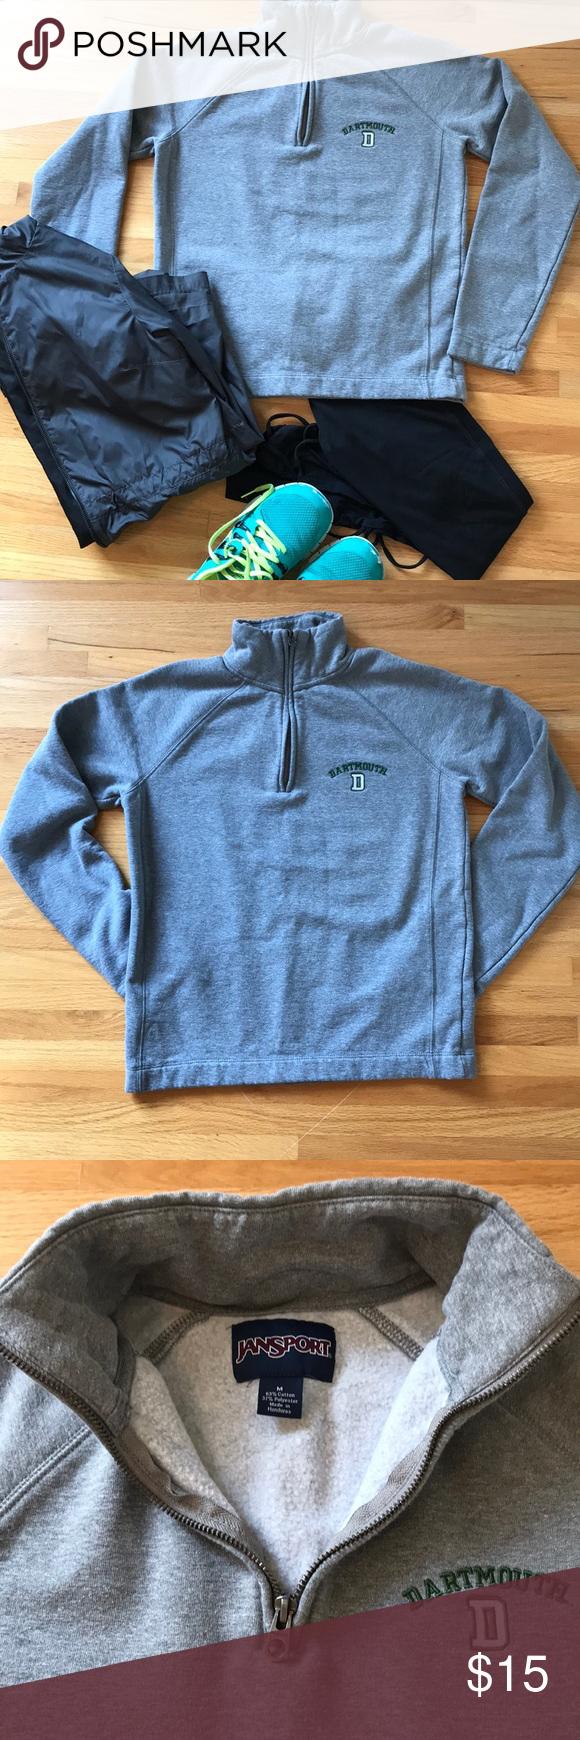 Dartmouth Sweatshirt Jansport Womens Clothes Design Women Fashion [ 1740 x 580 Pixel ]